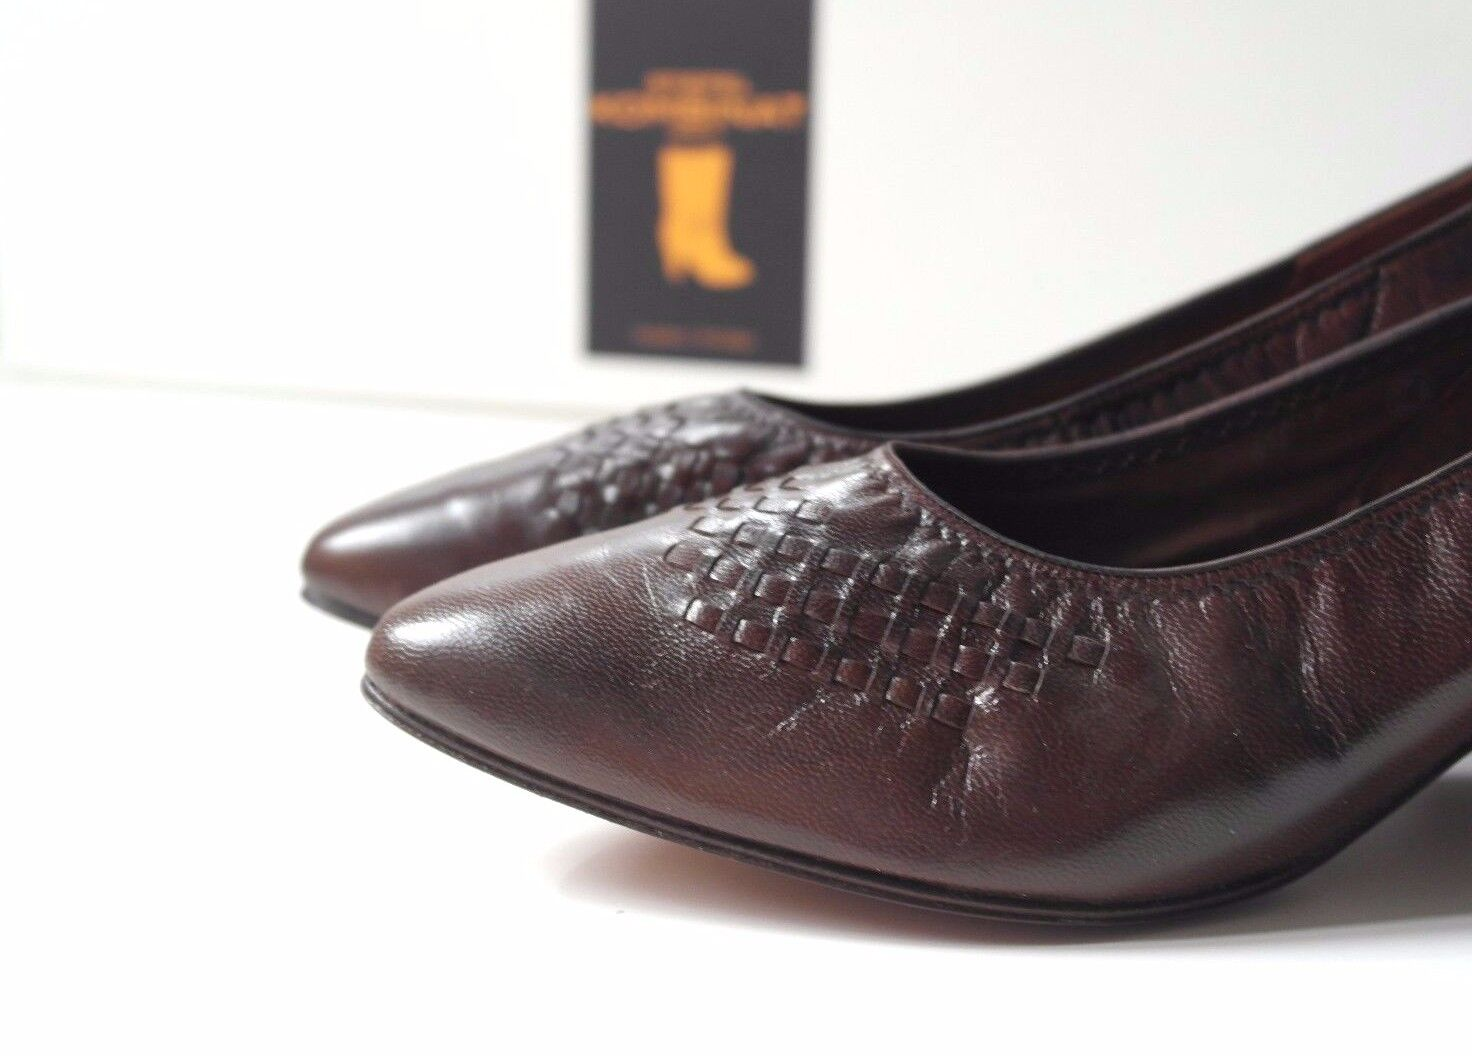 Rheinberger Rectosan Damen Pumps Schuhe TRUE VINTAGE Halbschuhe EUR 38 UK 4,5